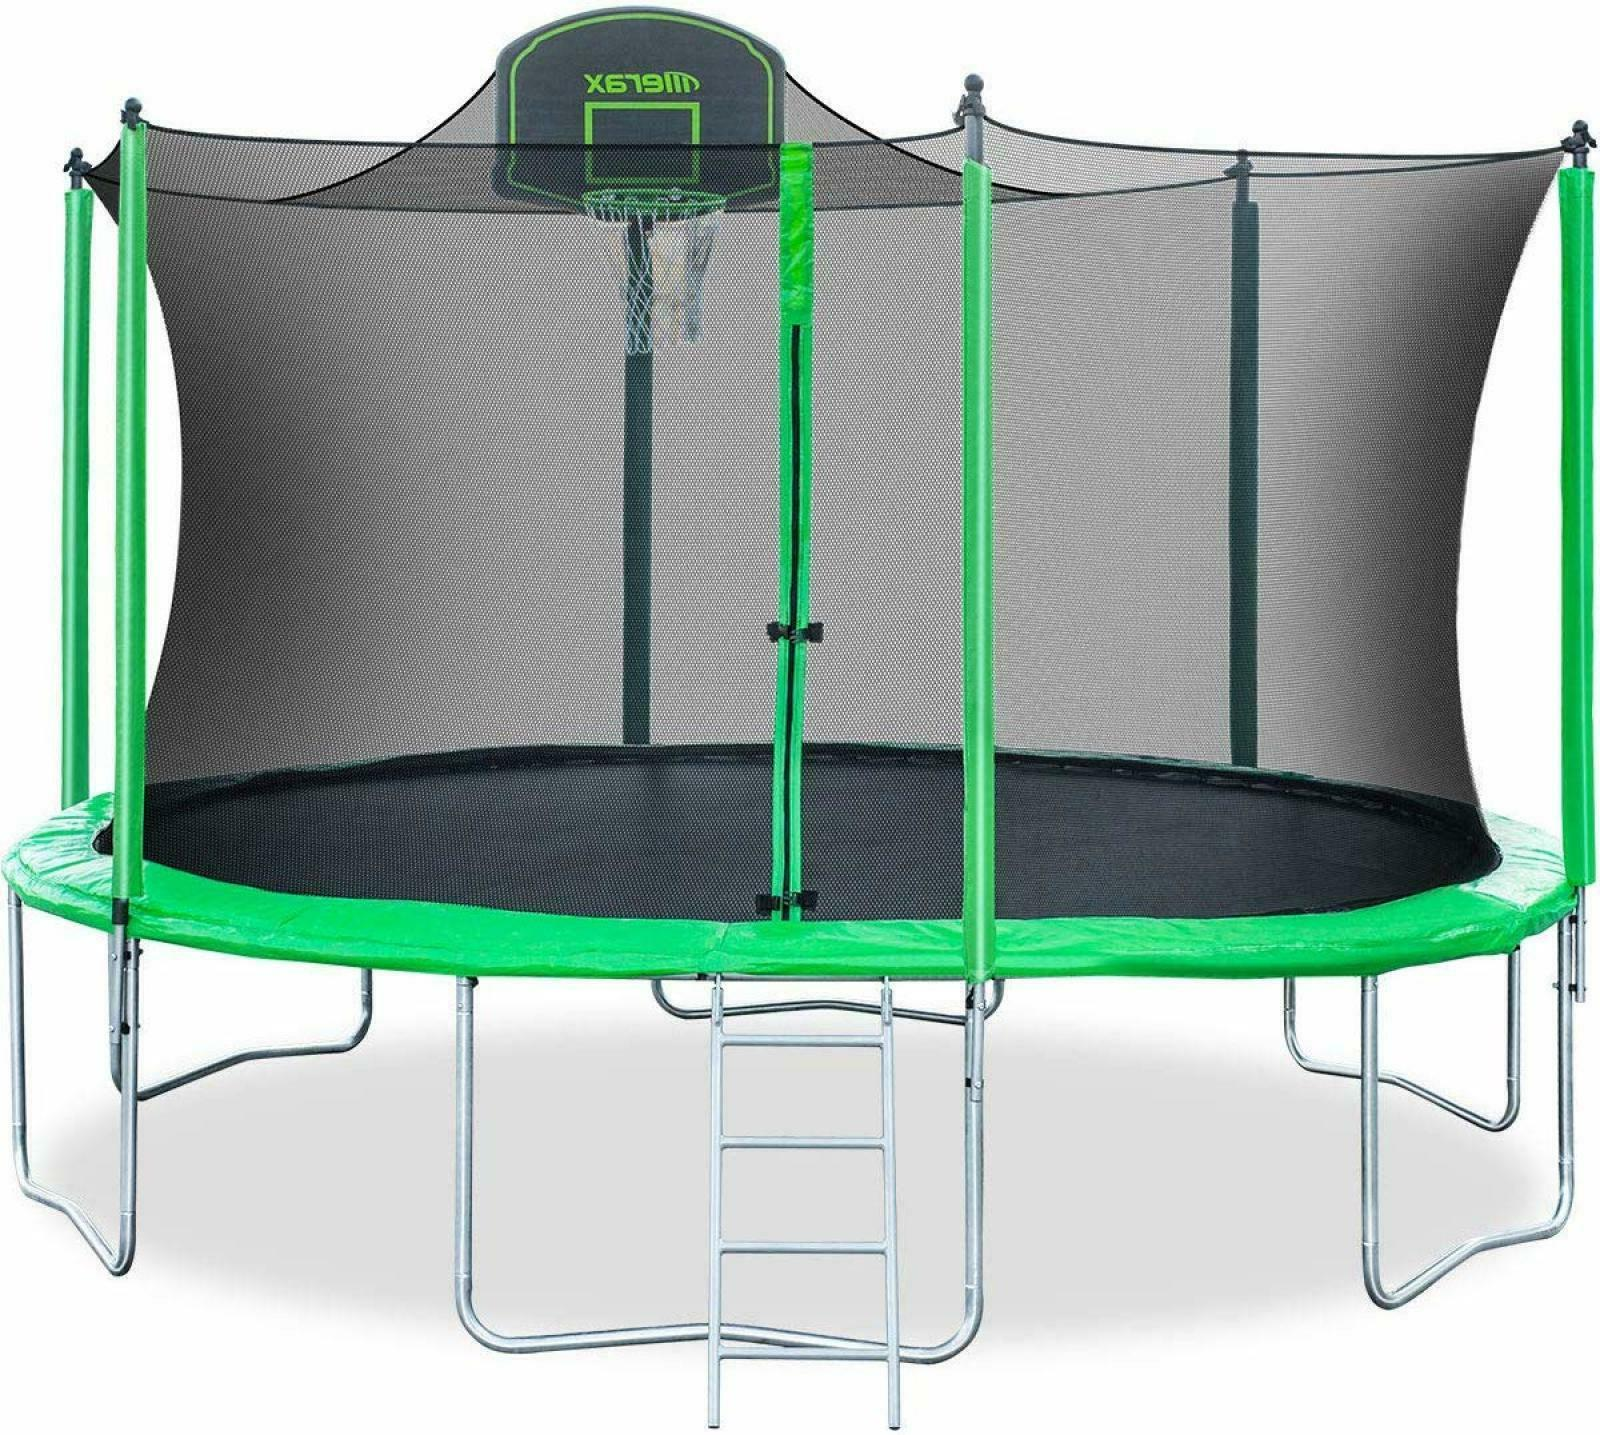 Merax 14FT 12FT Trampoline with Safety Enclosure Net, Basket